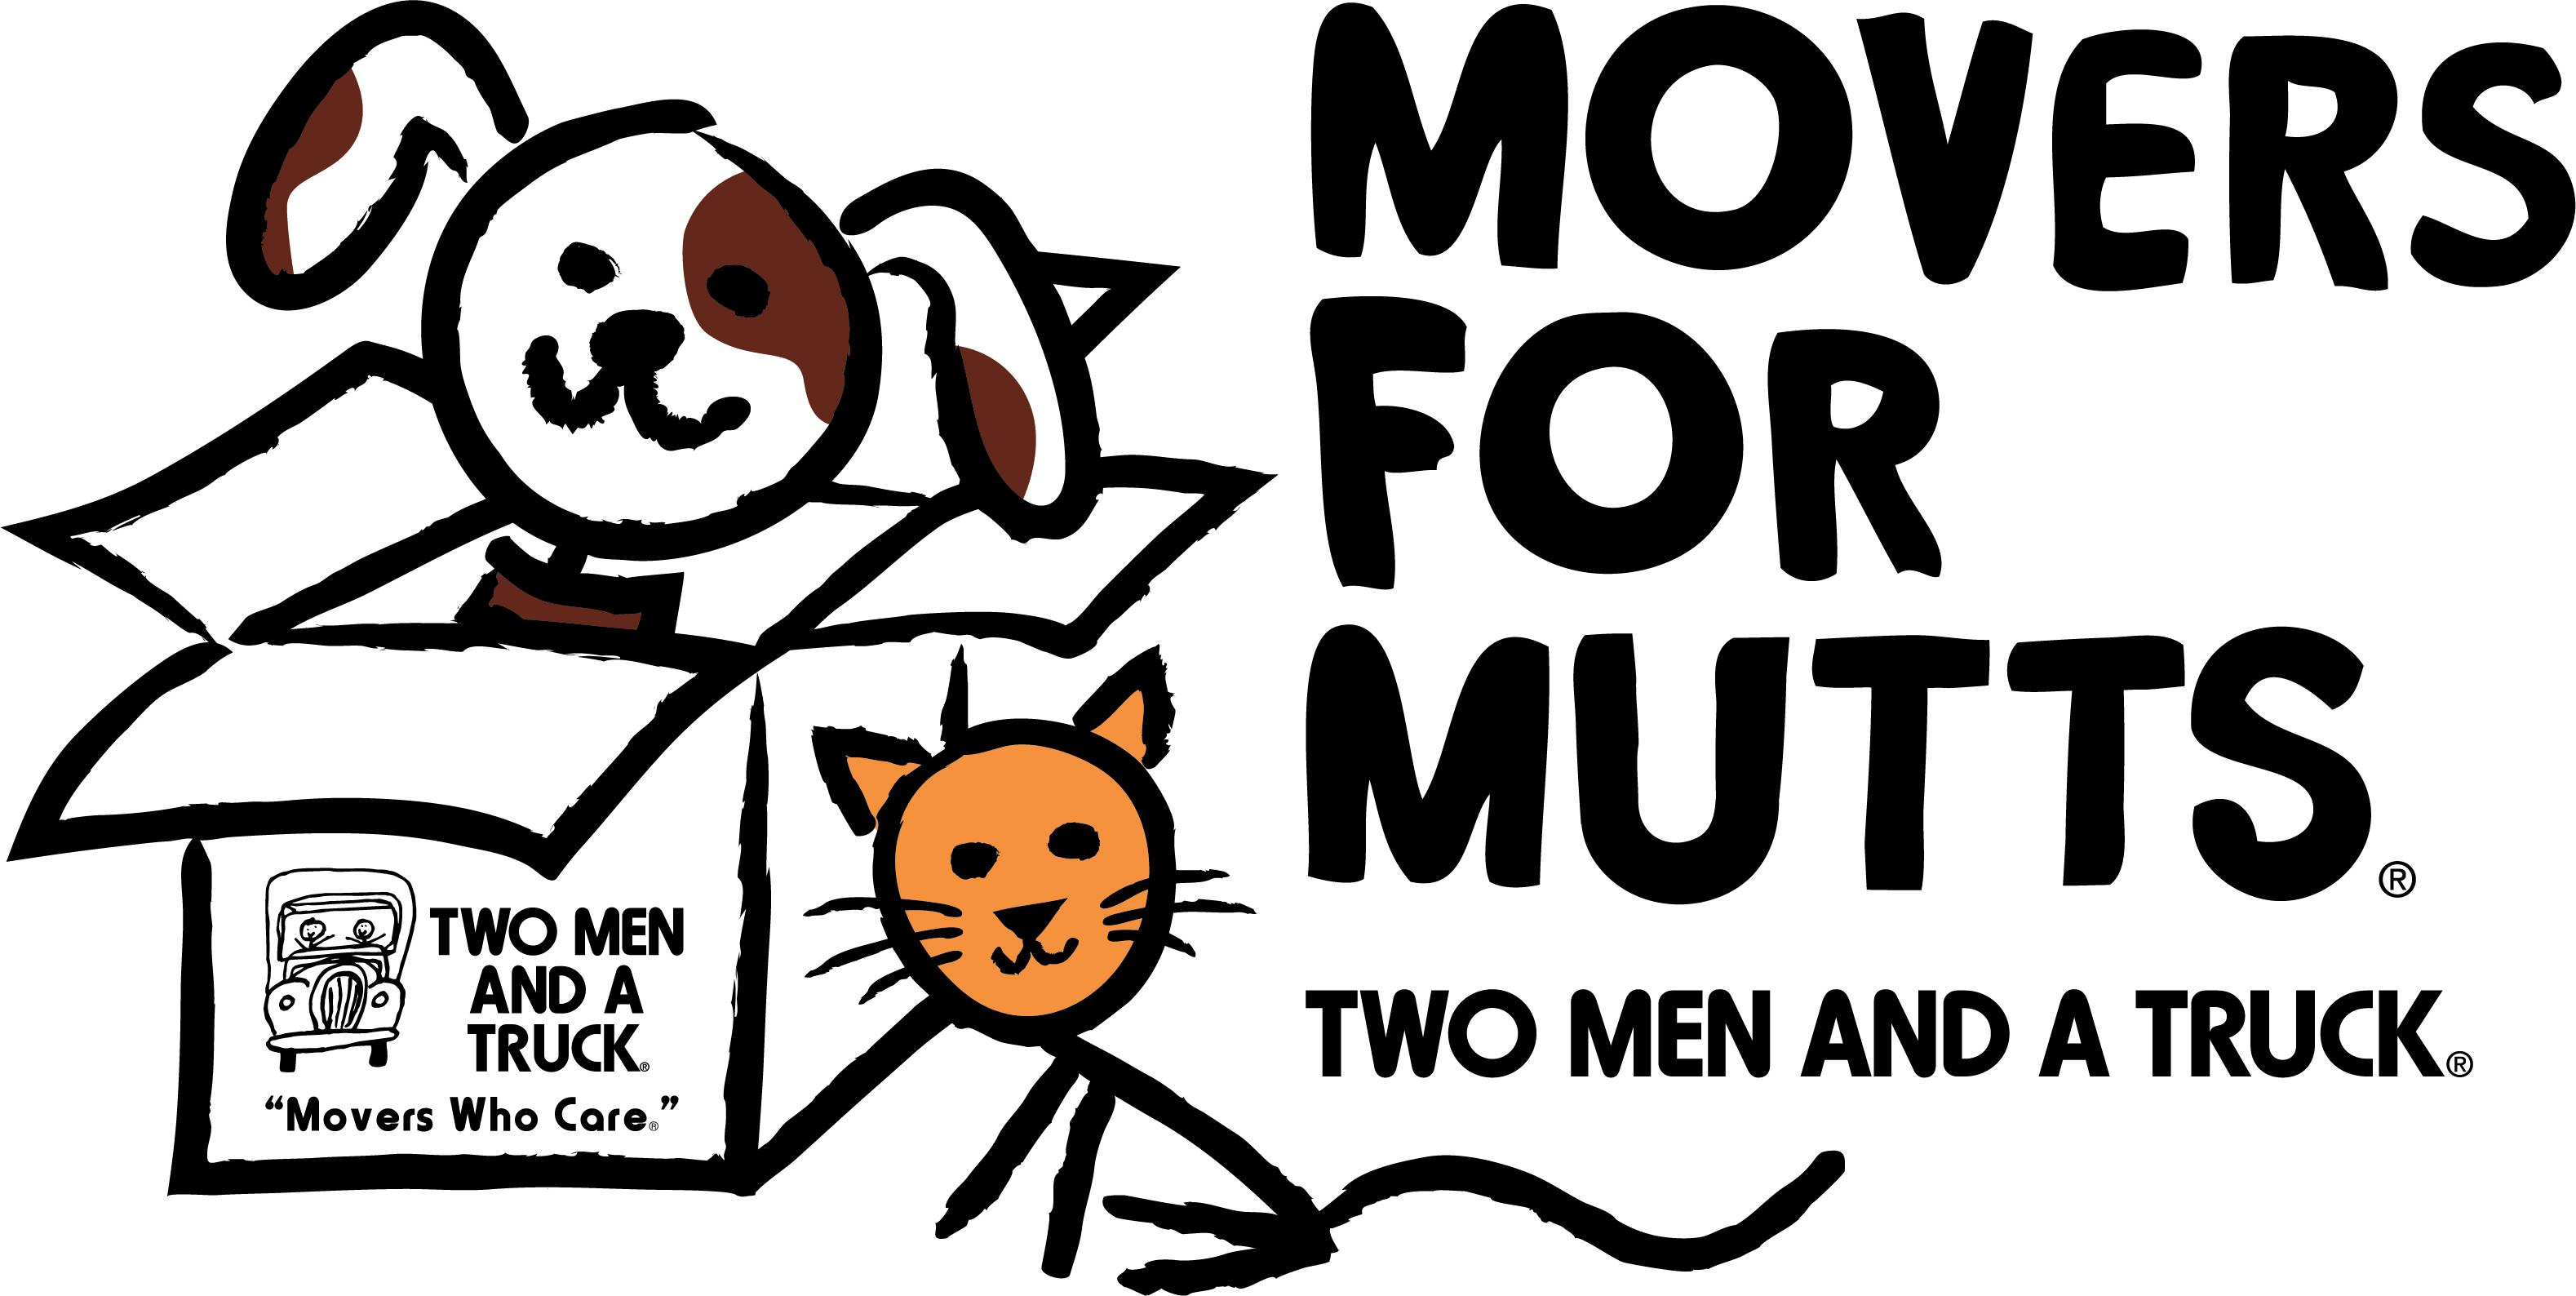 m4mutts